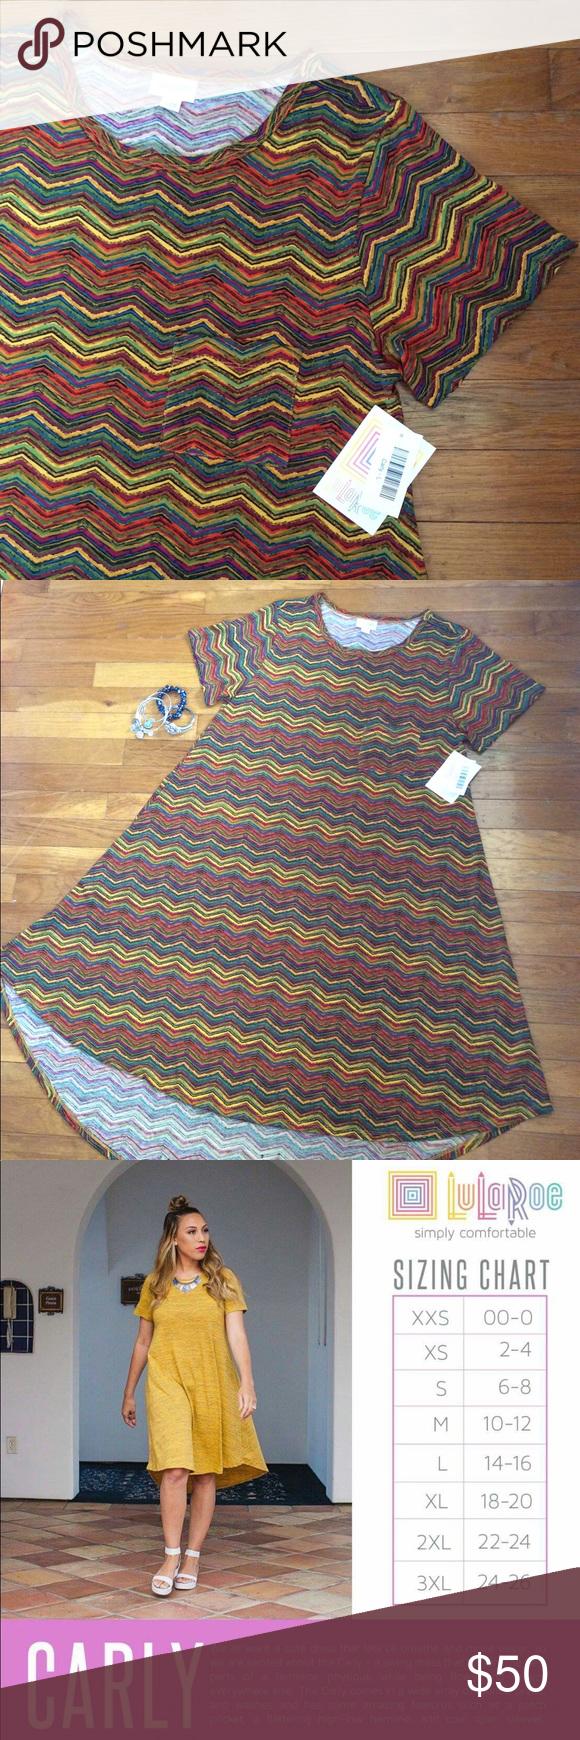 c9c7019d7058 Rainbow Striped Carly Swing Dress This LuLaRoe Carly is super fun! It has a  rainbow